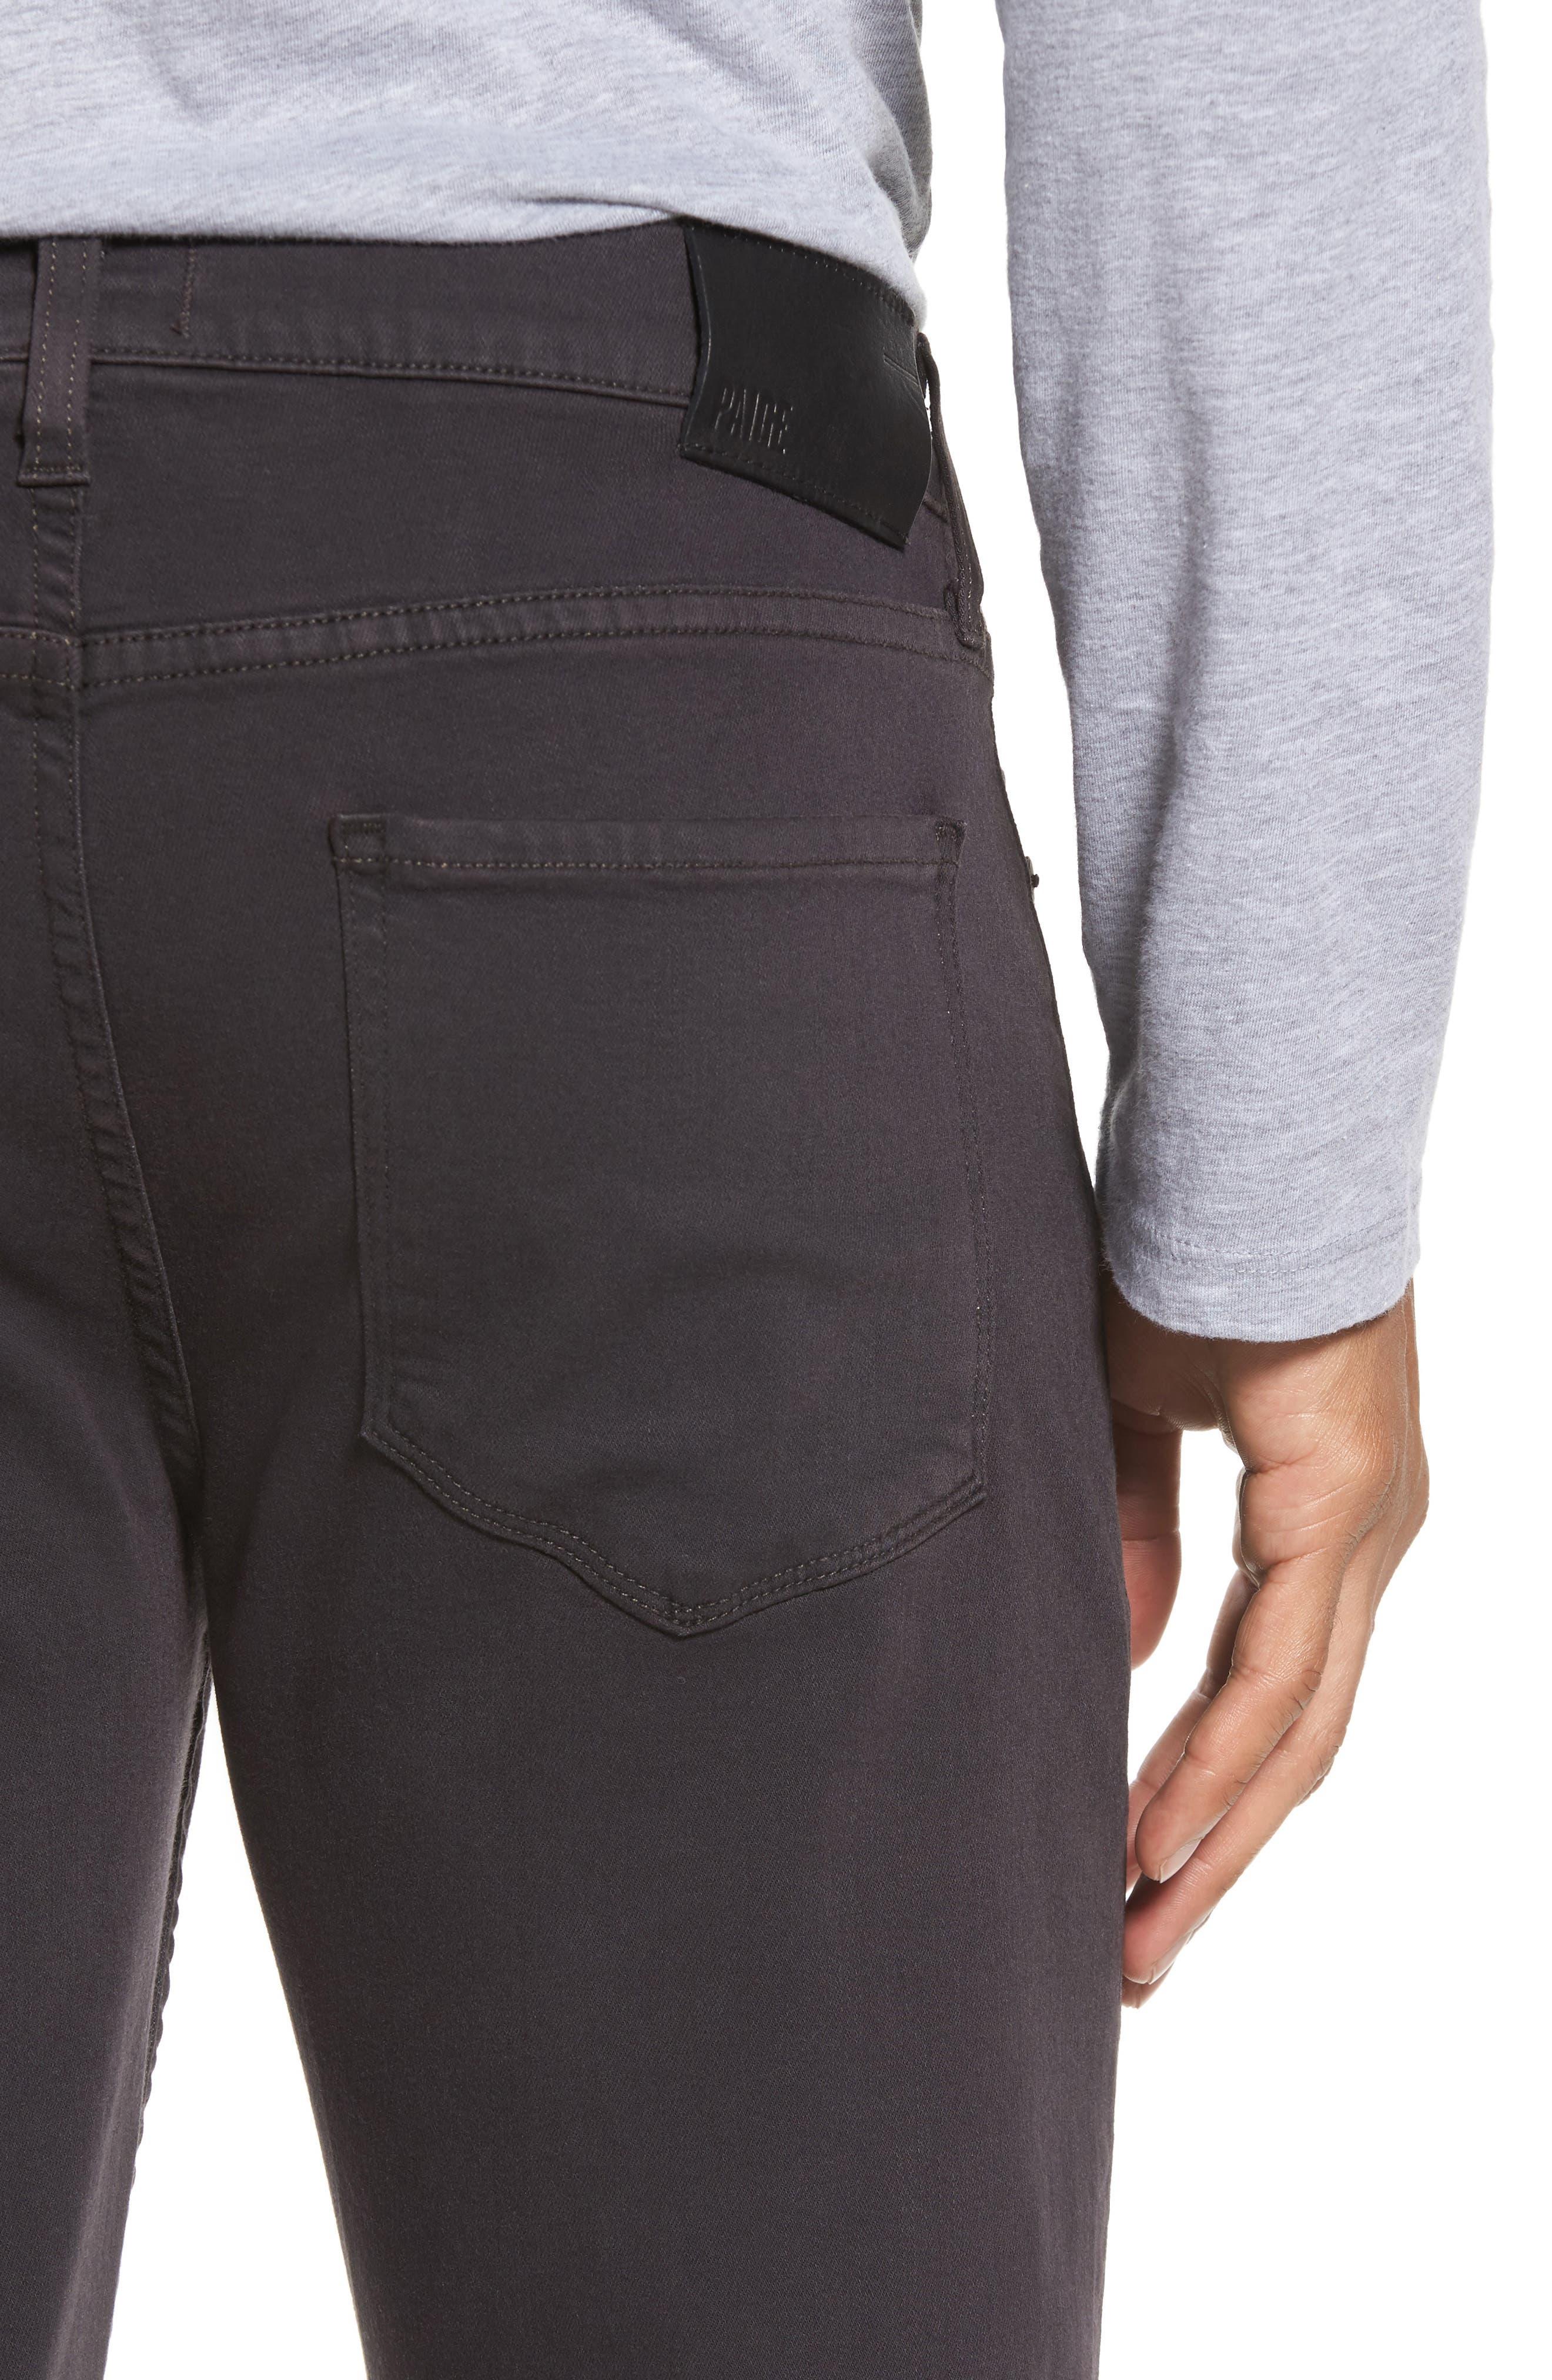 Transcend - Lennox Slim Fit Jeans,                             Alternate thumbnail 4, color,                             021